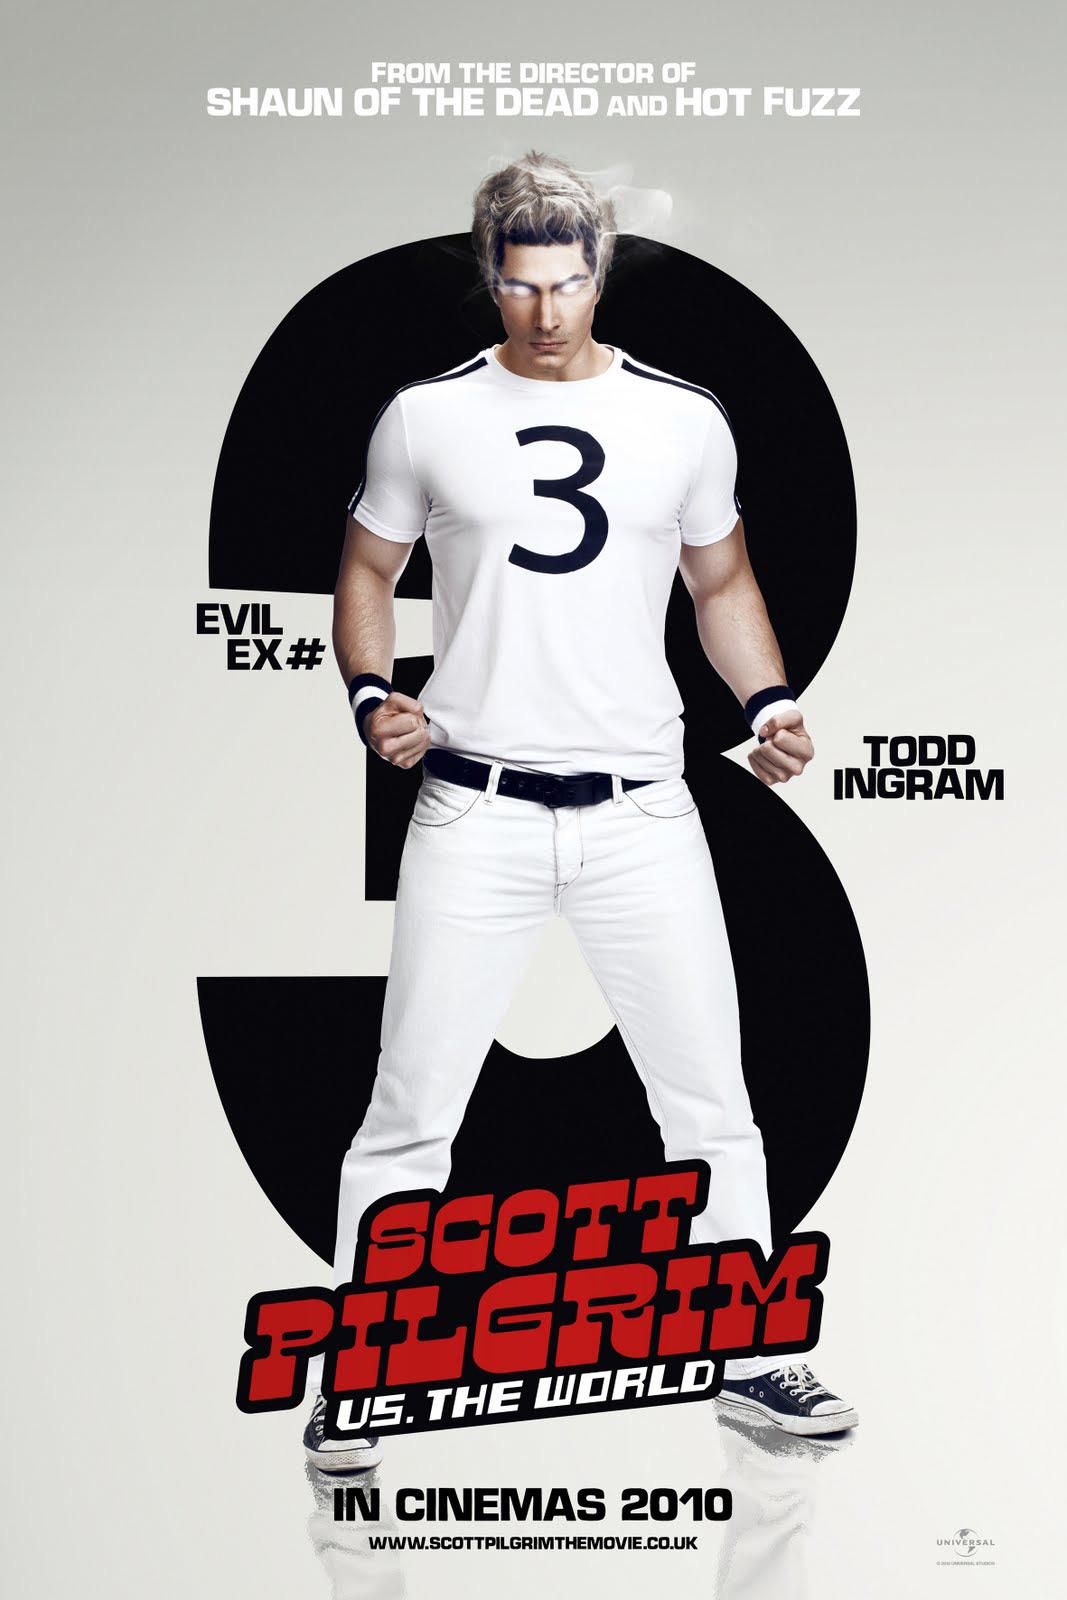 Scott Pilgrim Movie Posters Of The Evil Exe S